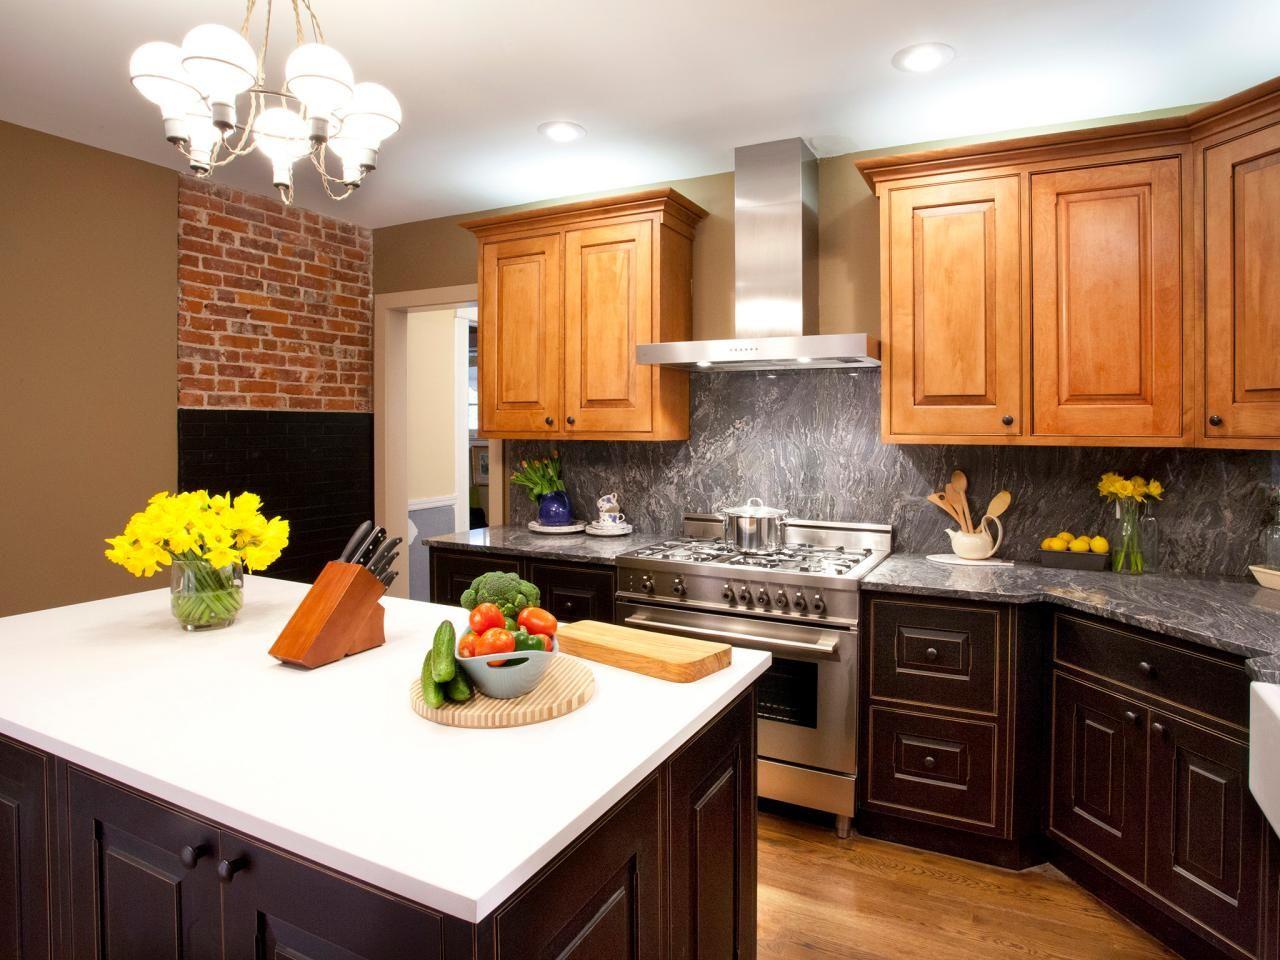 Granite Countertop Prices Kitchen countertops, Cost of